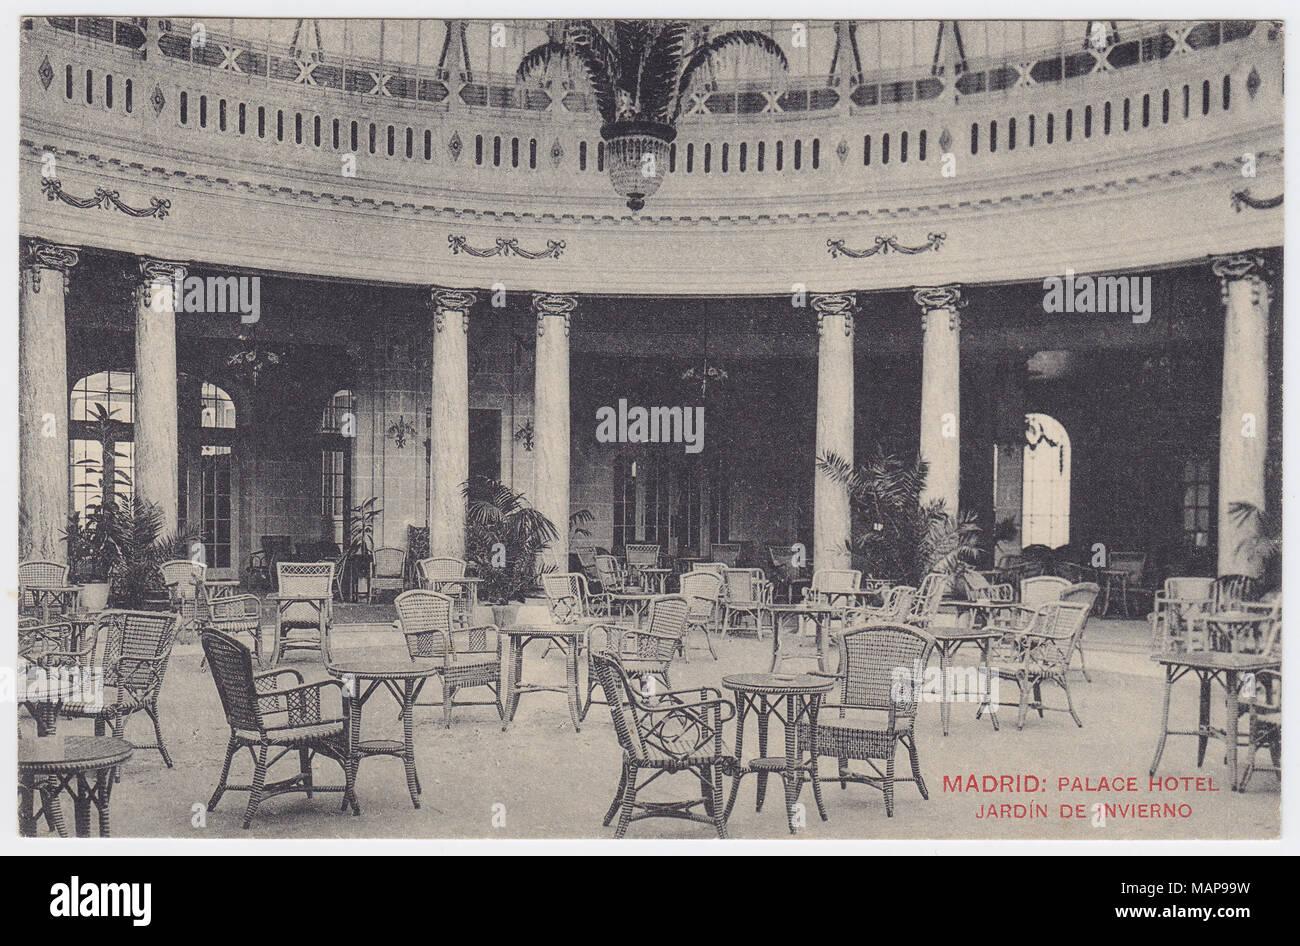 Palace Hotel, Madrid, Spain, Winter Garden / Rotonda, ca. 1912 - Stock Image